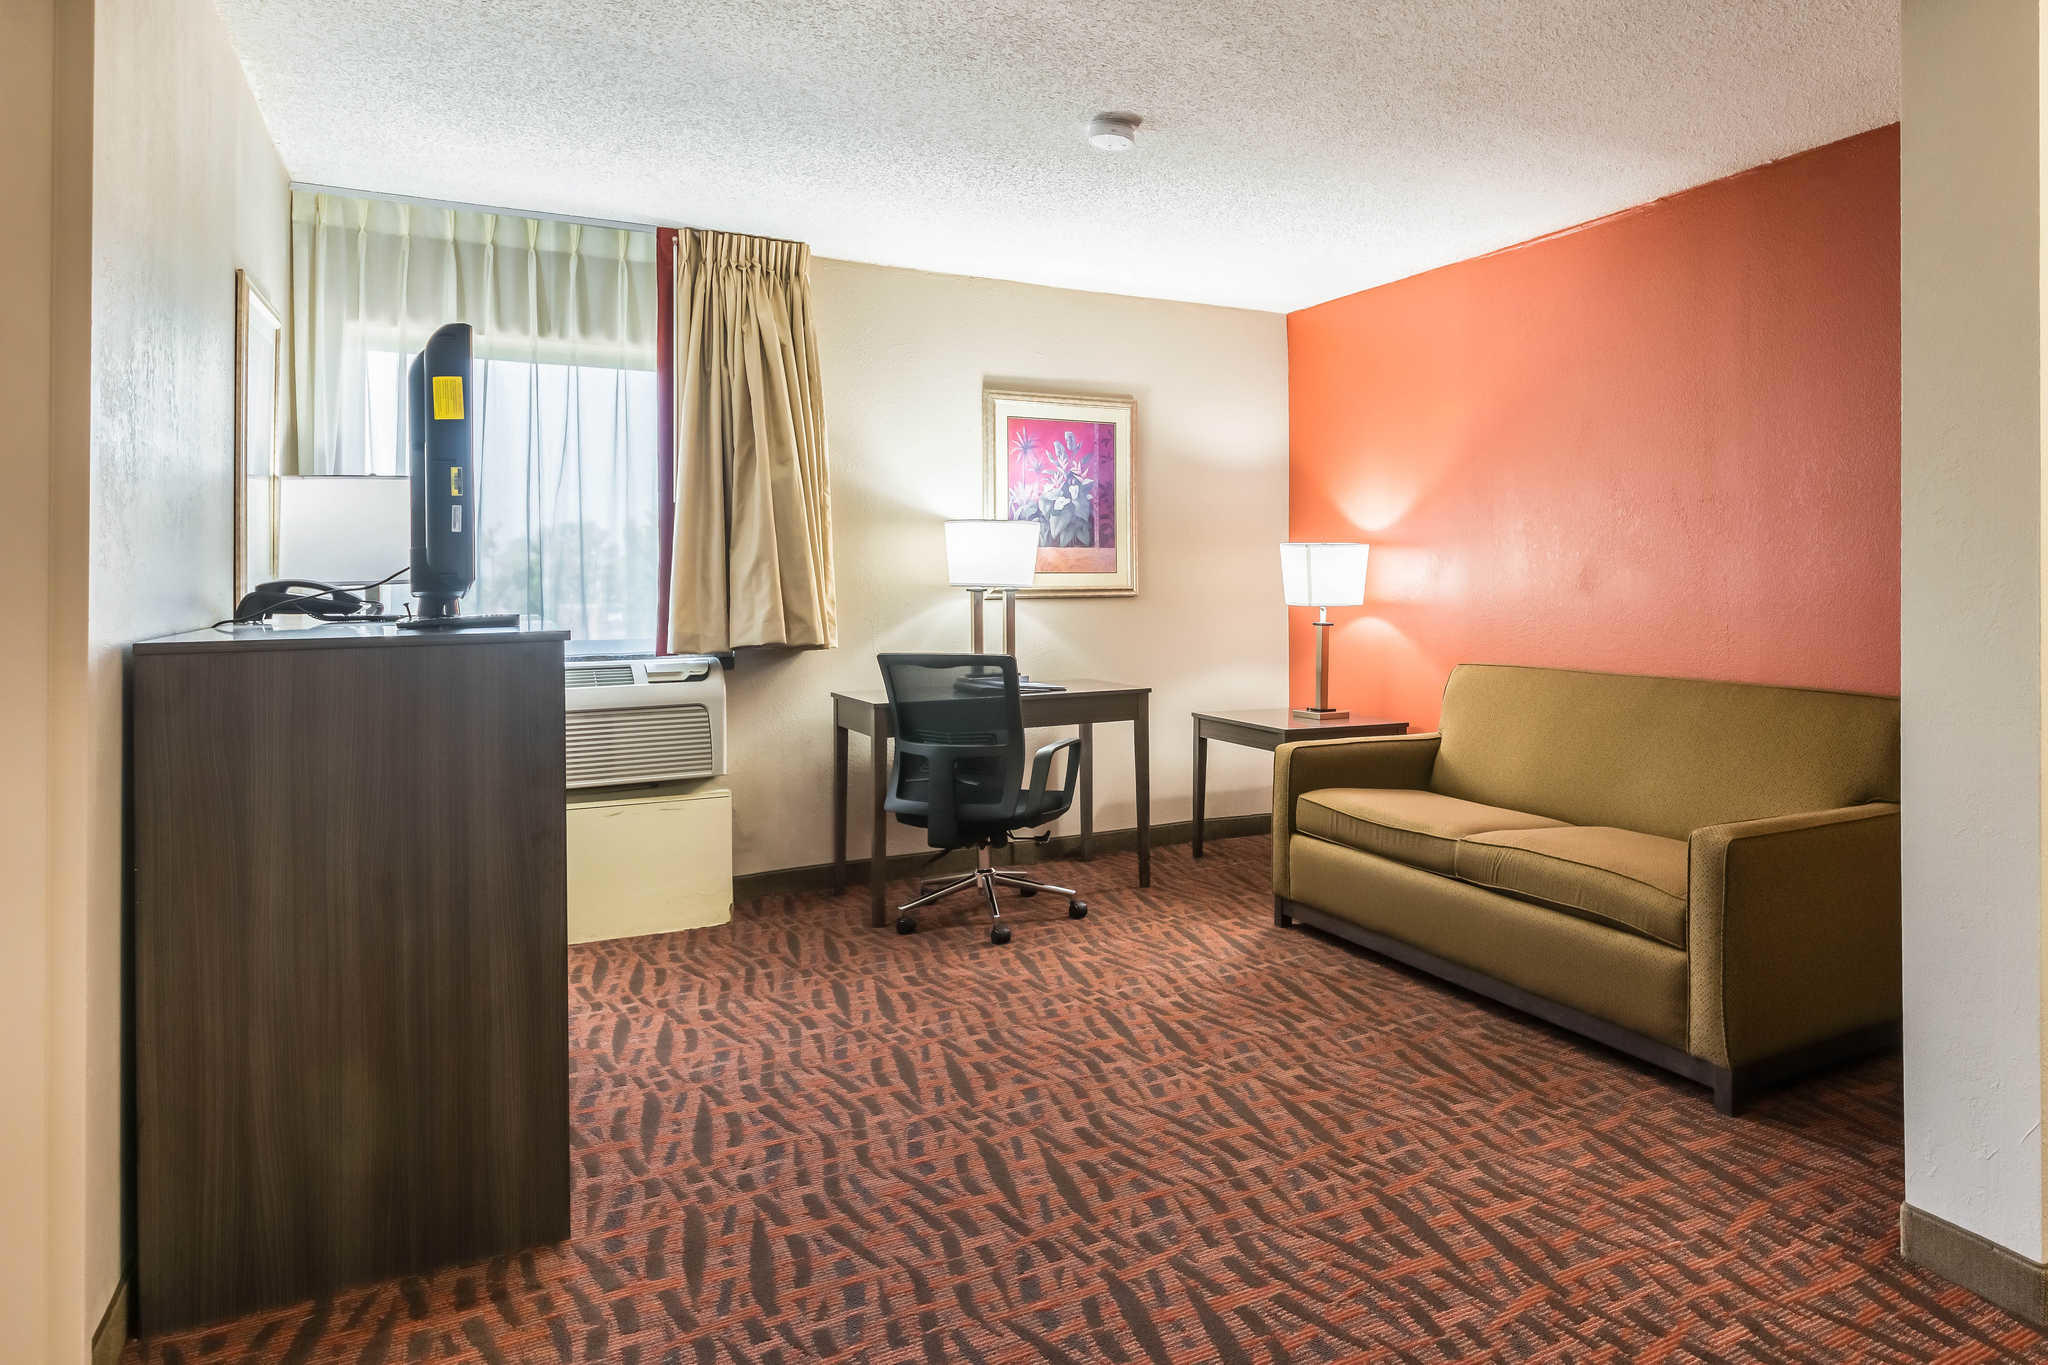 Clarion Inn & Suites image 24